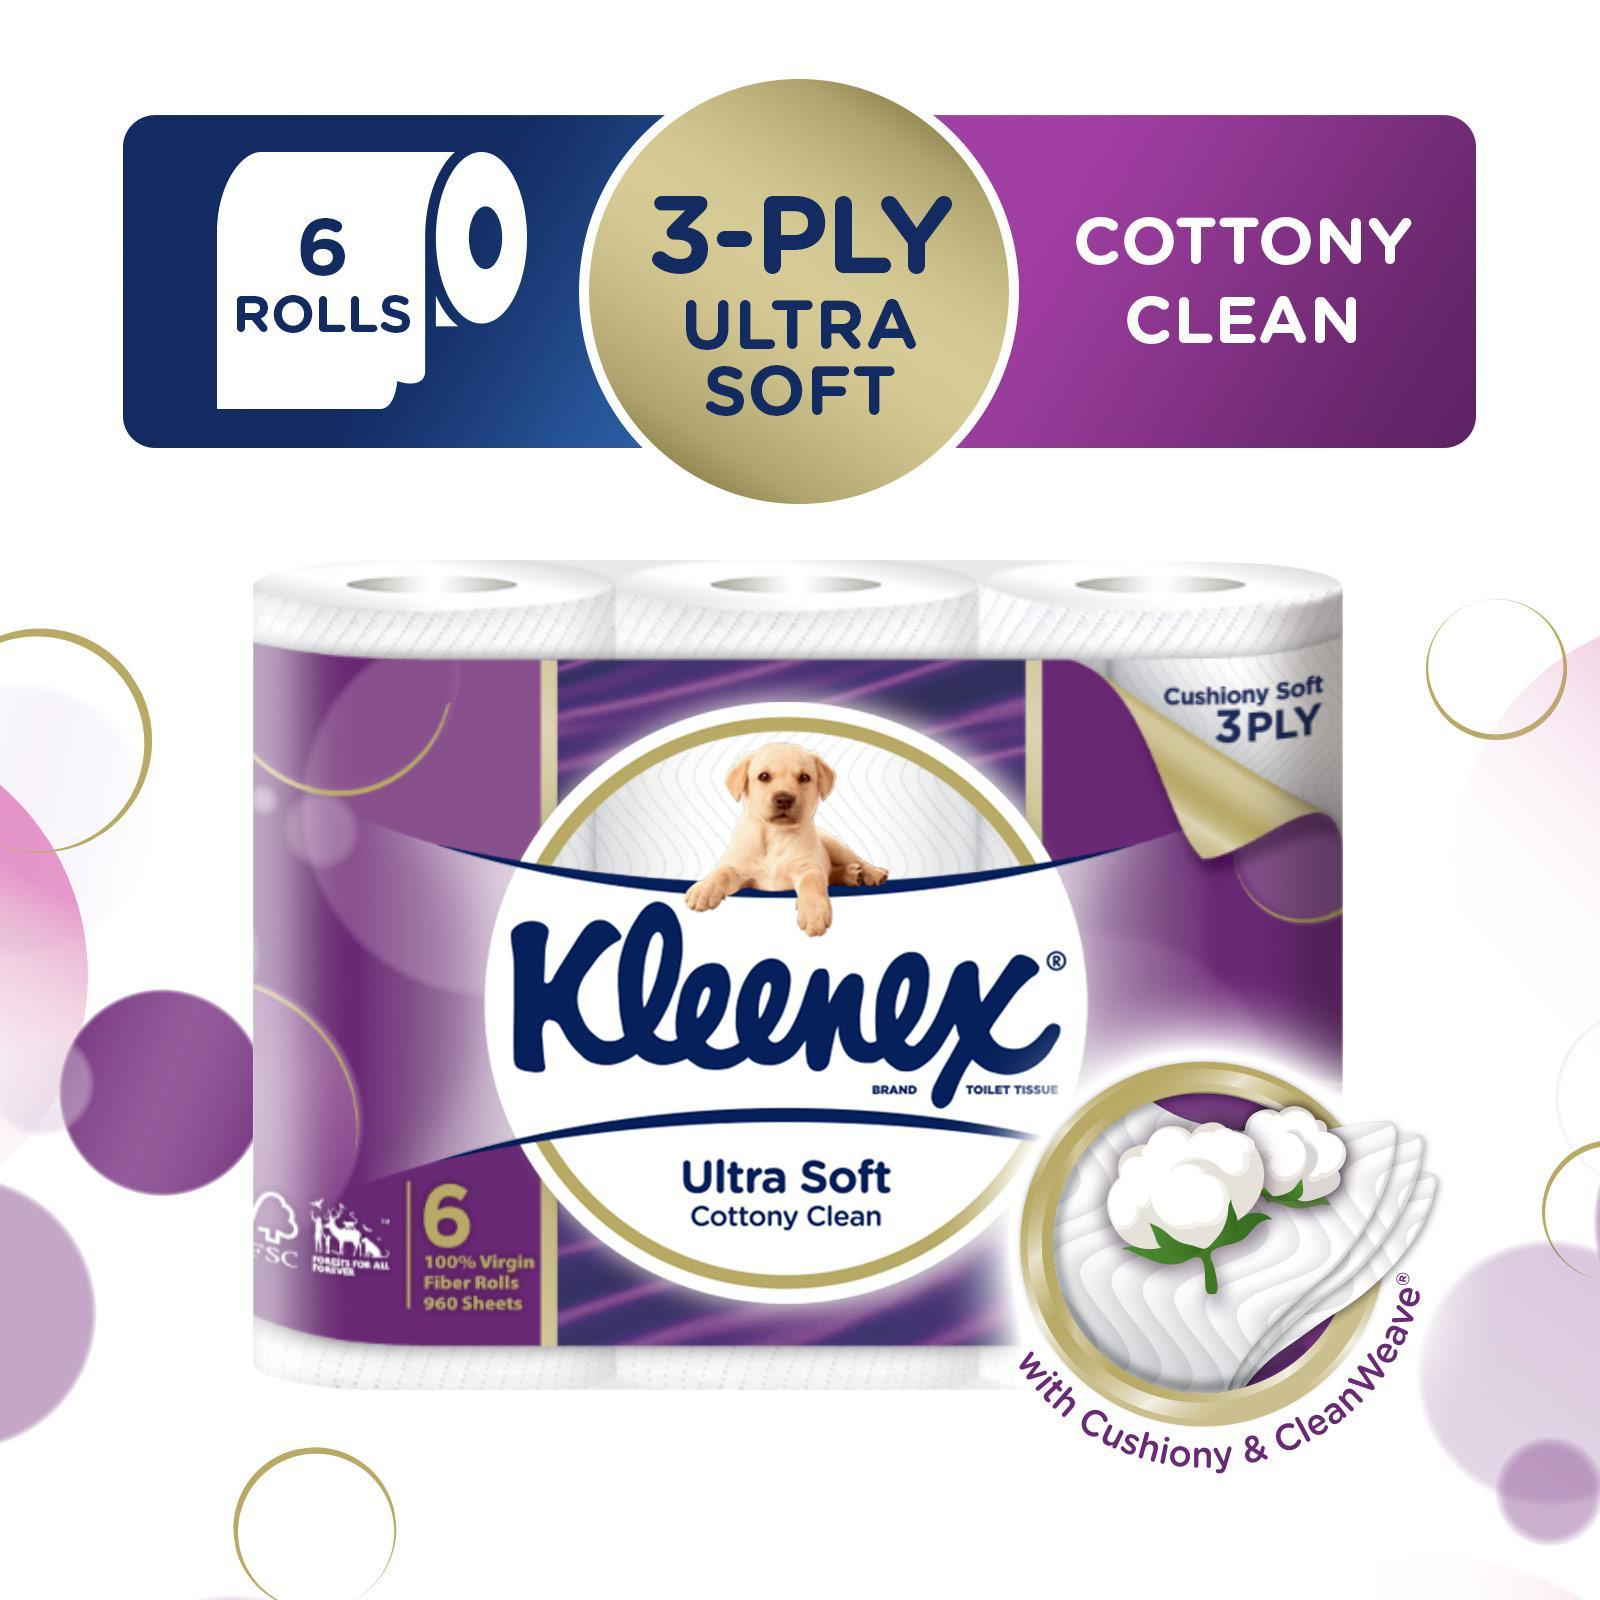 Kleenex Ultra Soft 3-Ply Toilet Tissue - 6 Rolls